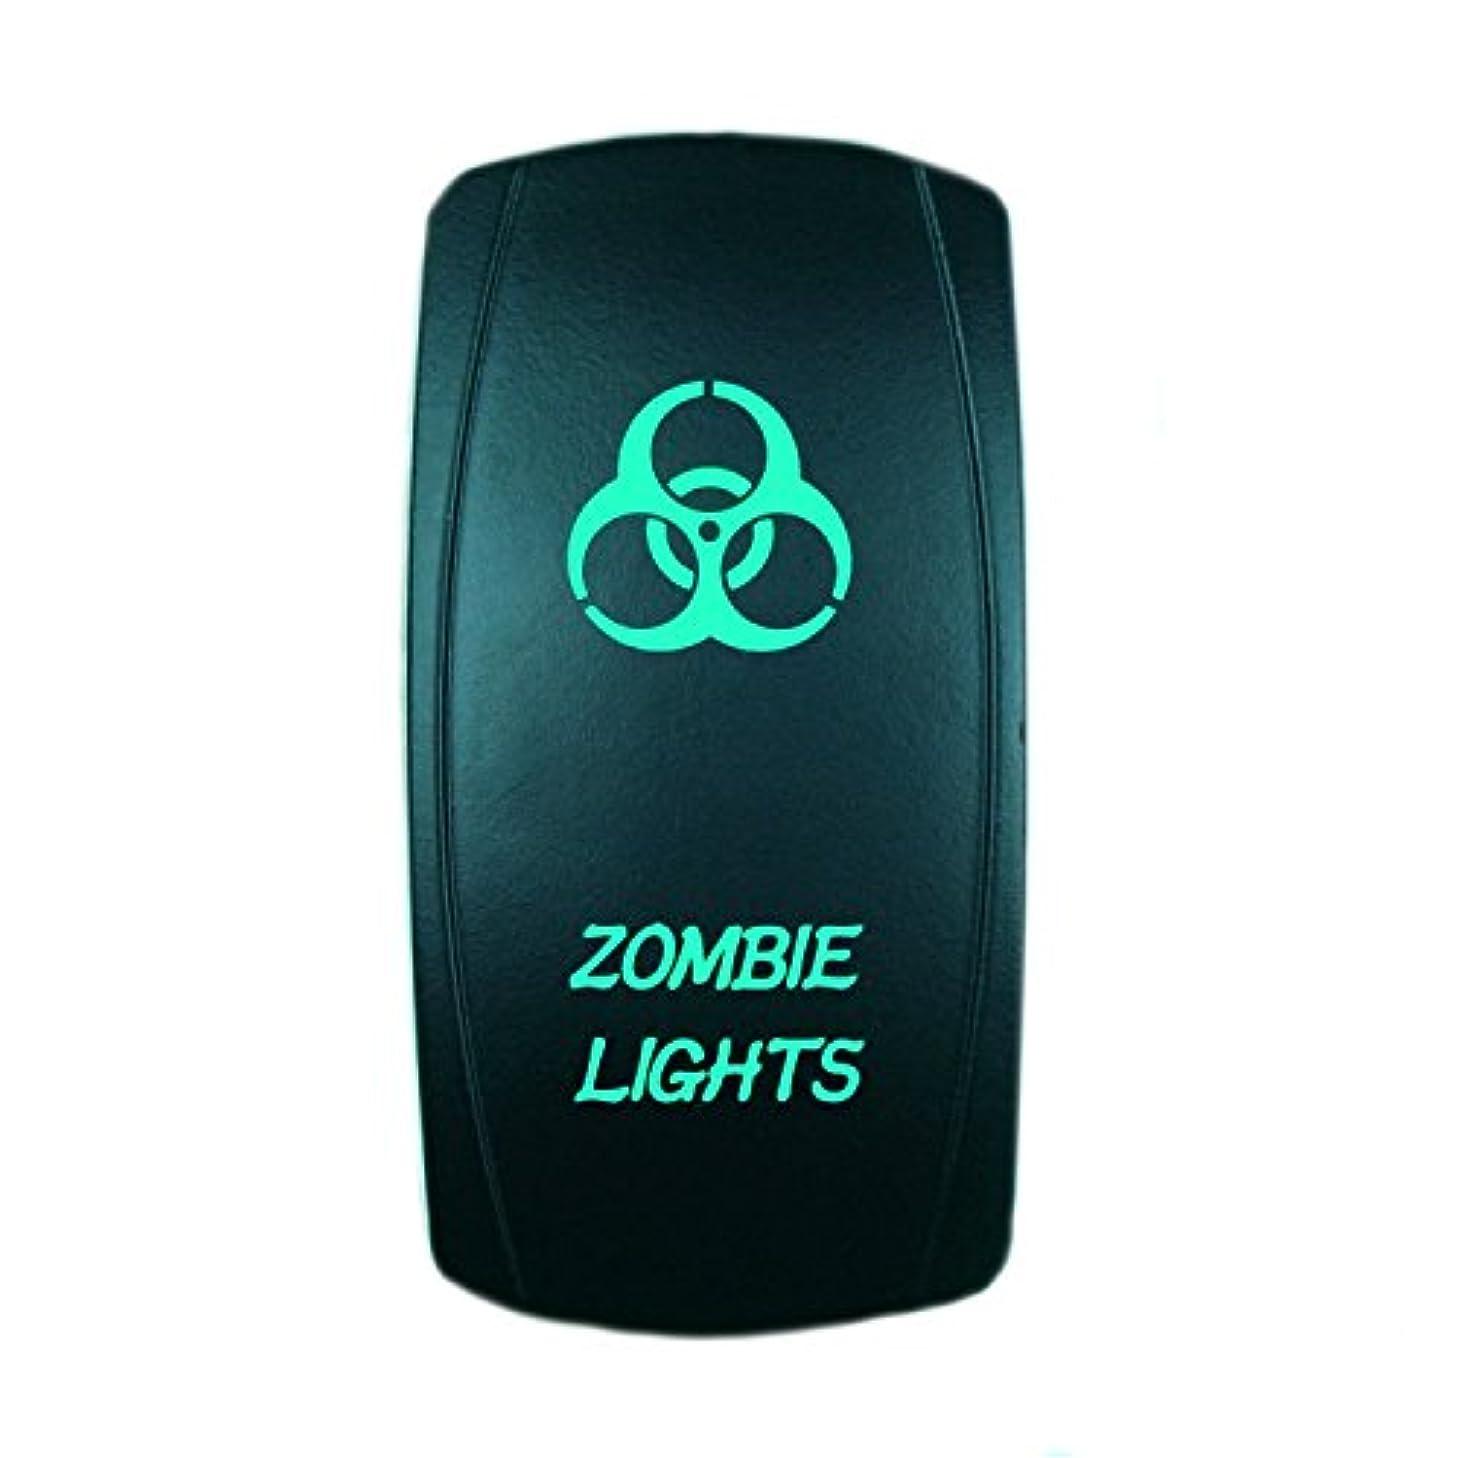 QUNQI STAR 5 pin Laser Backlit Rocker Switch ZOMBIE LIGHTS 20A 12V On/off LED Light Toggle Switch (Green)